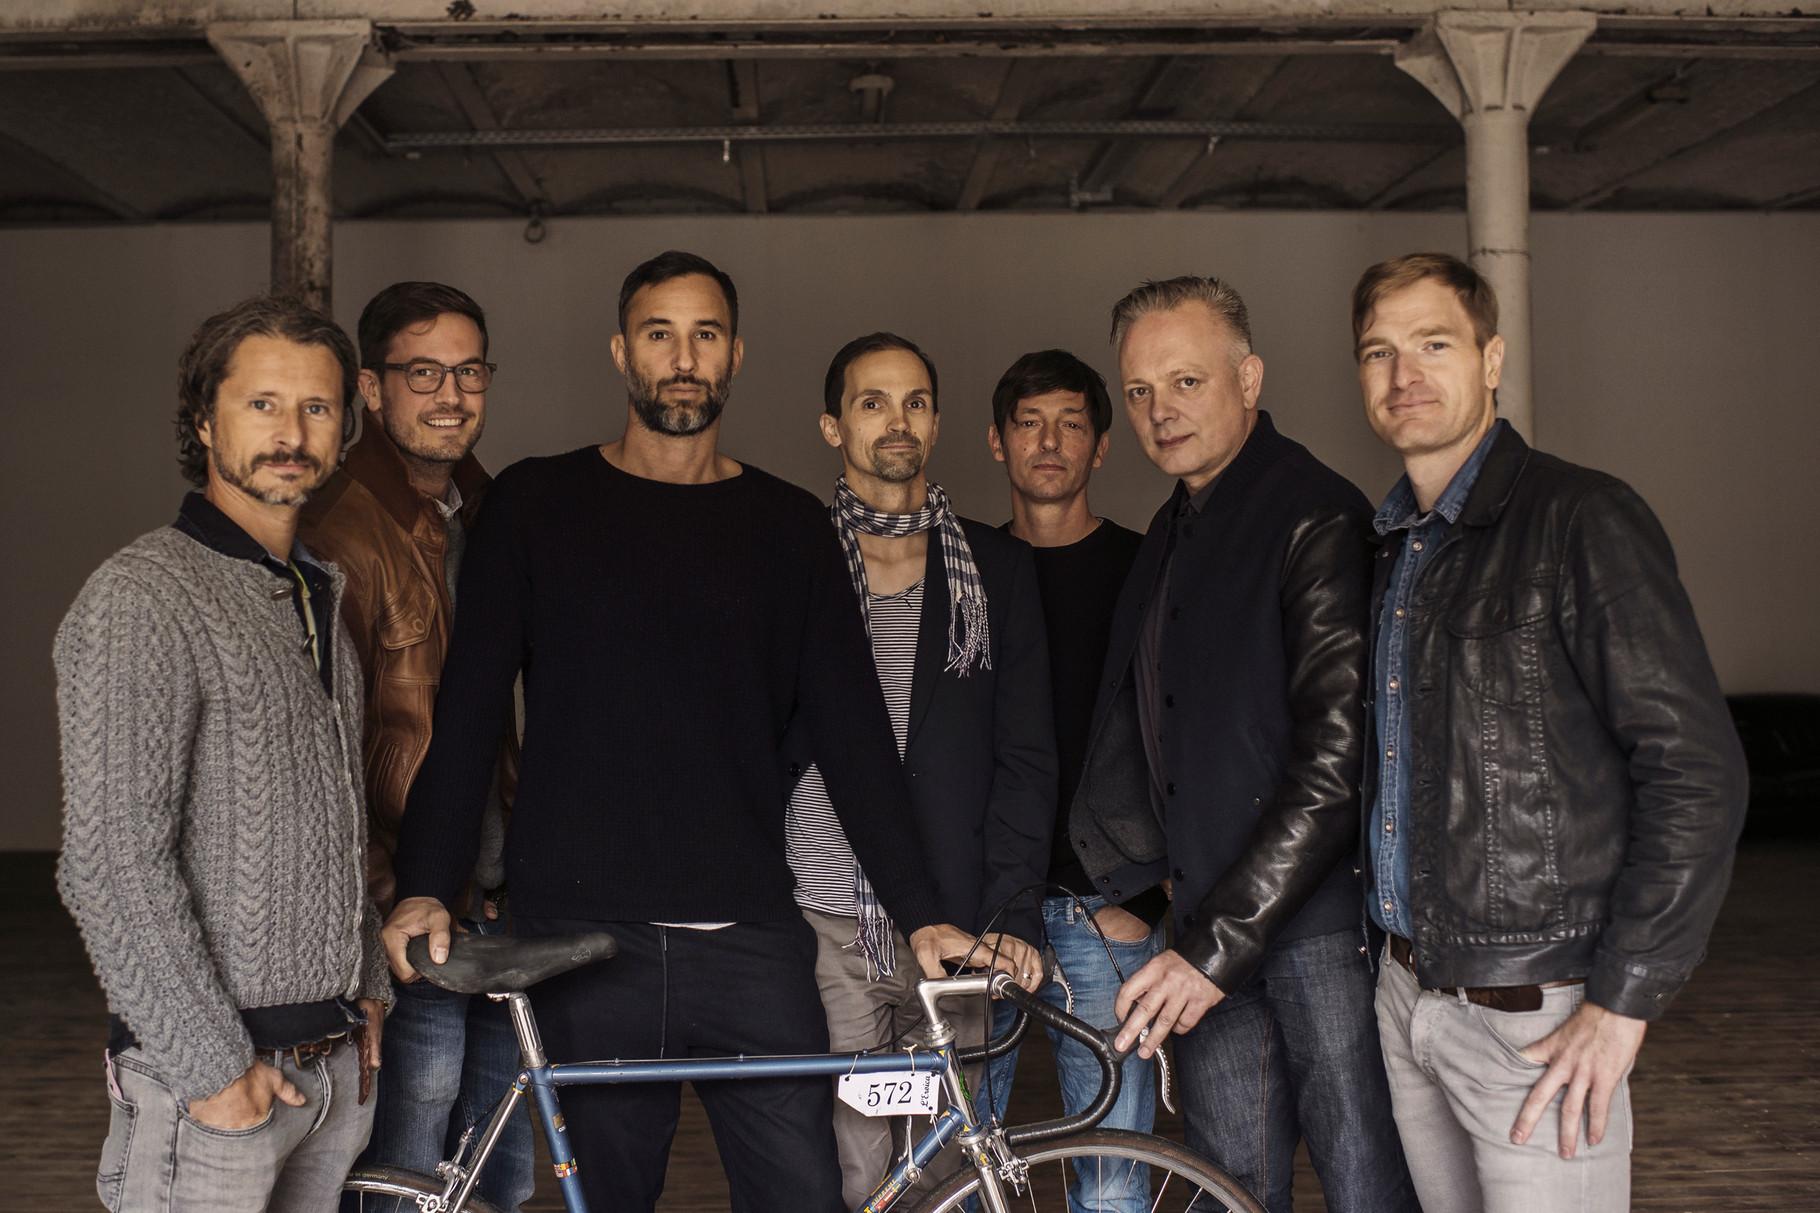 © Berliner Fahrradschau - Team